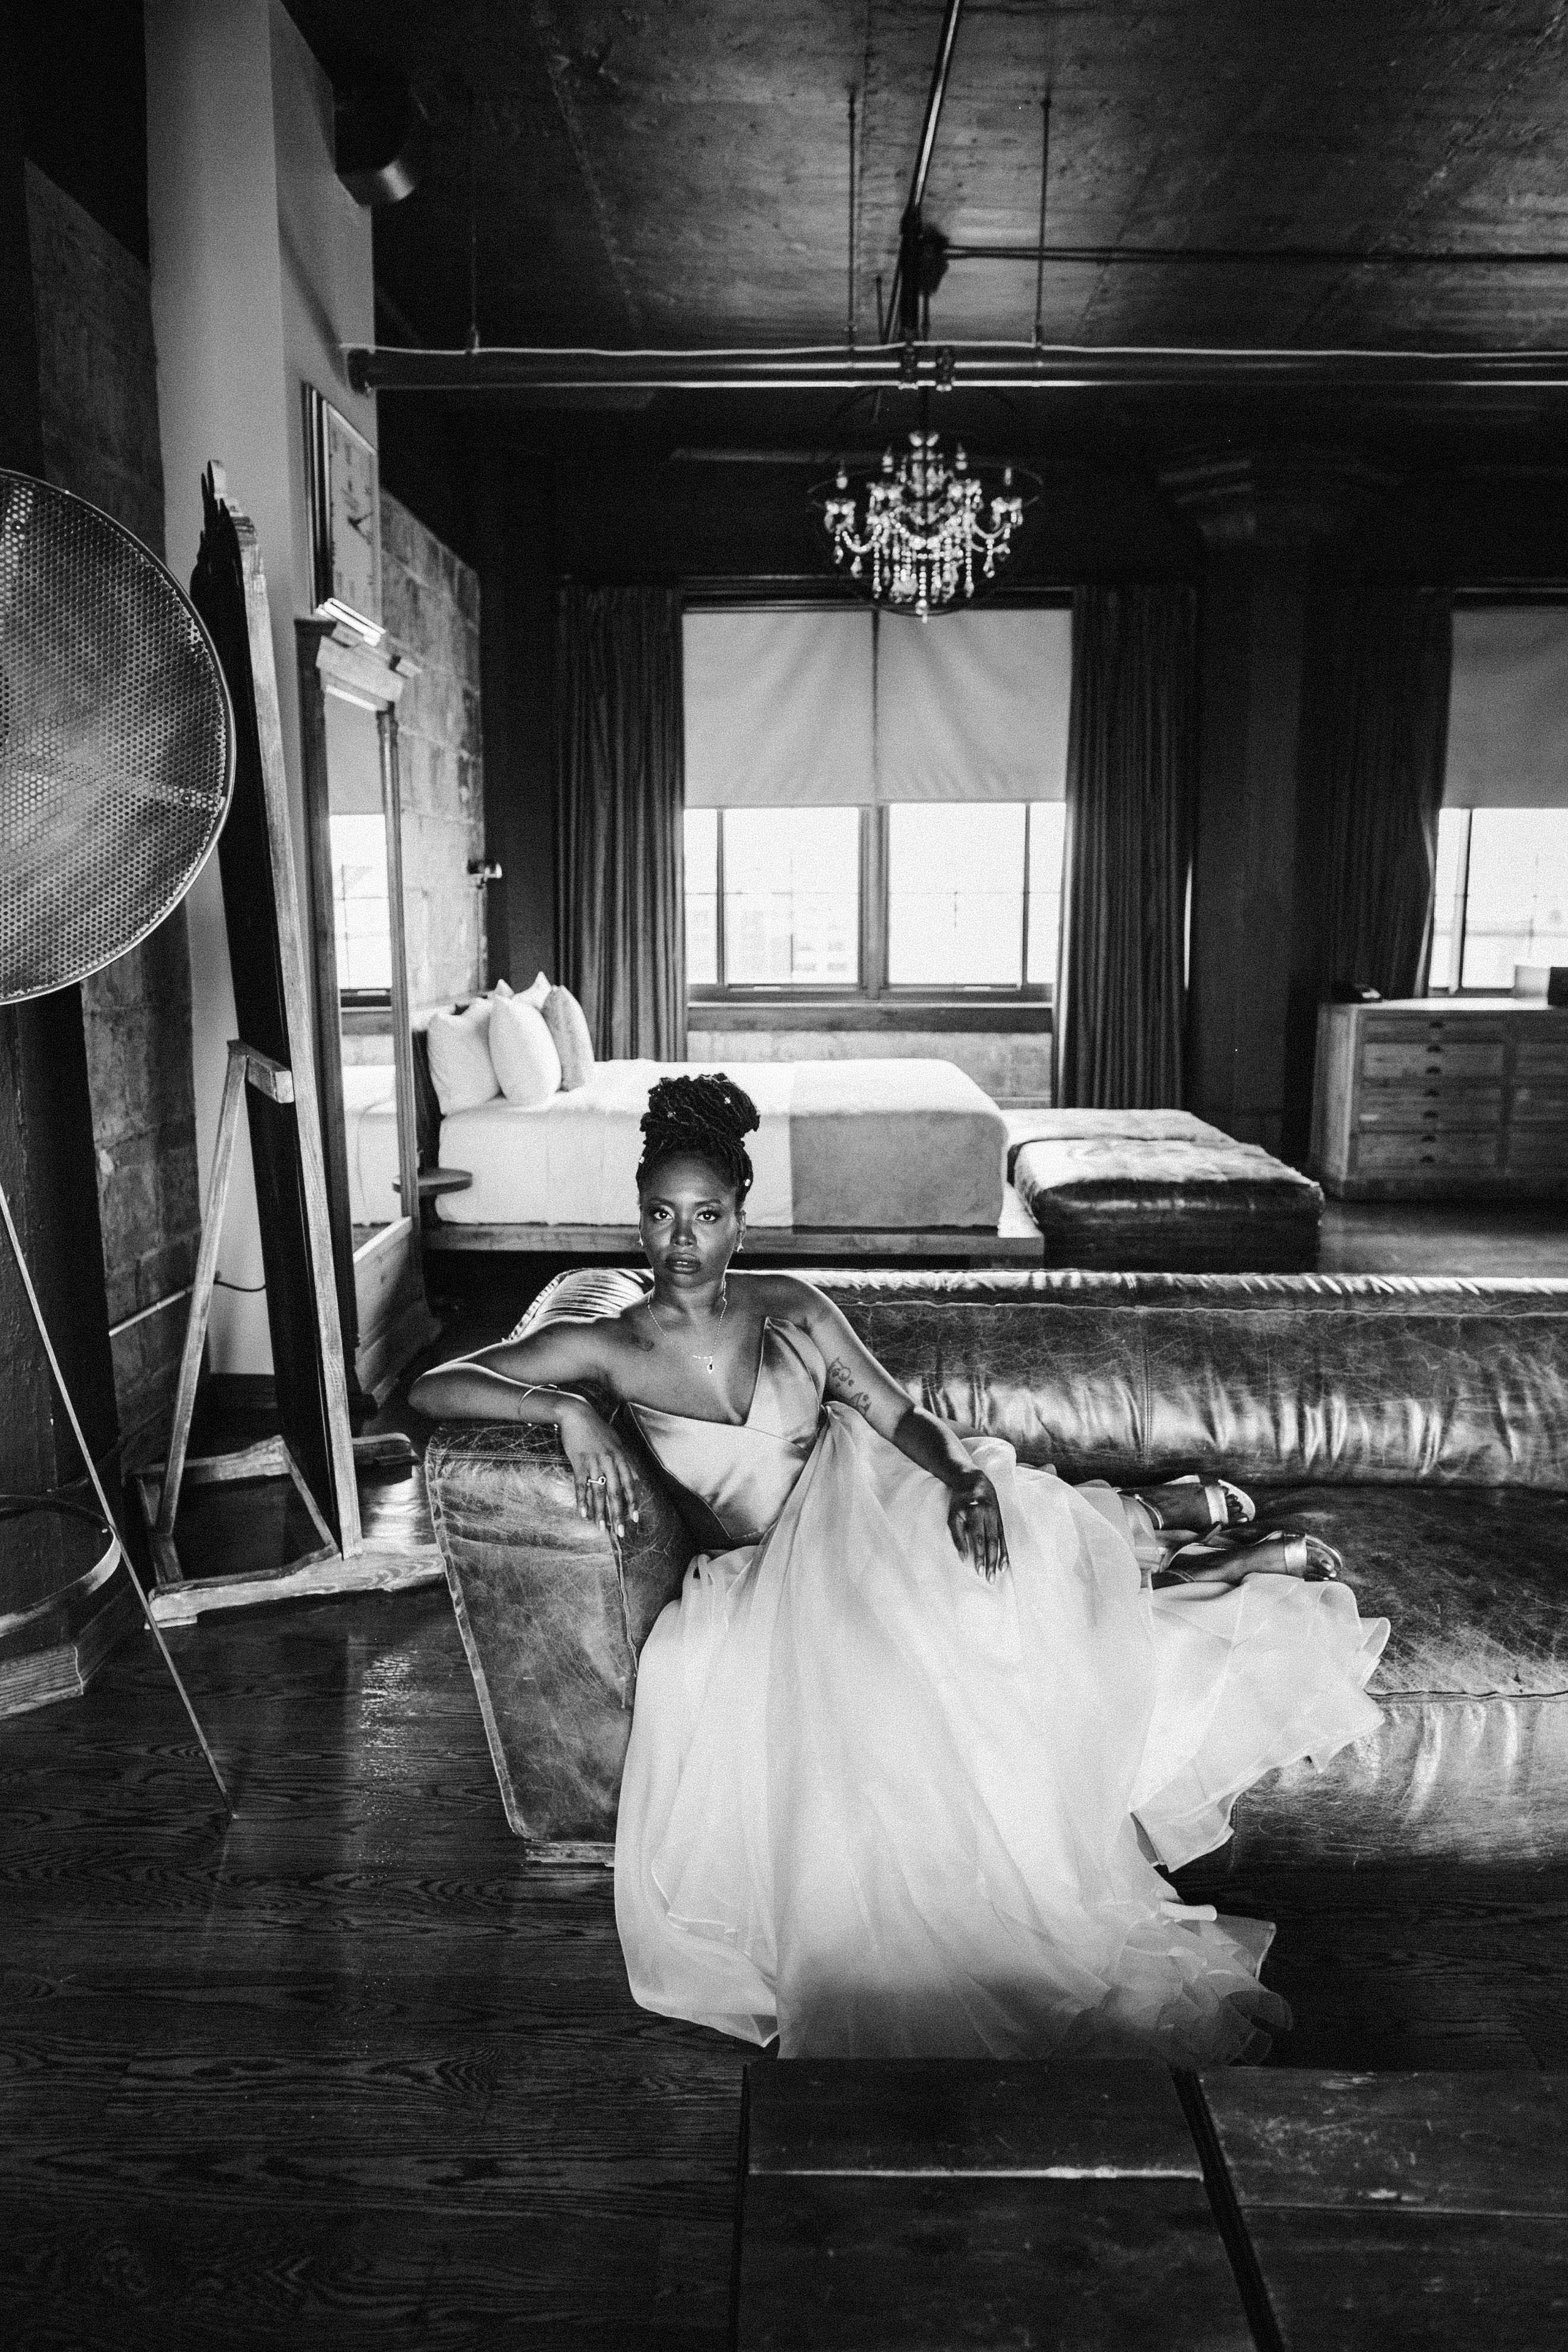 Sevlynn-Photography-Wedding-LIC-Landing-Maiella-NYC-28.jpg